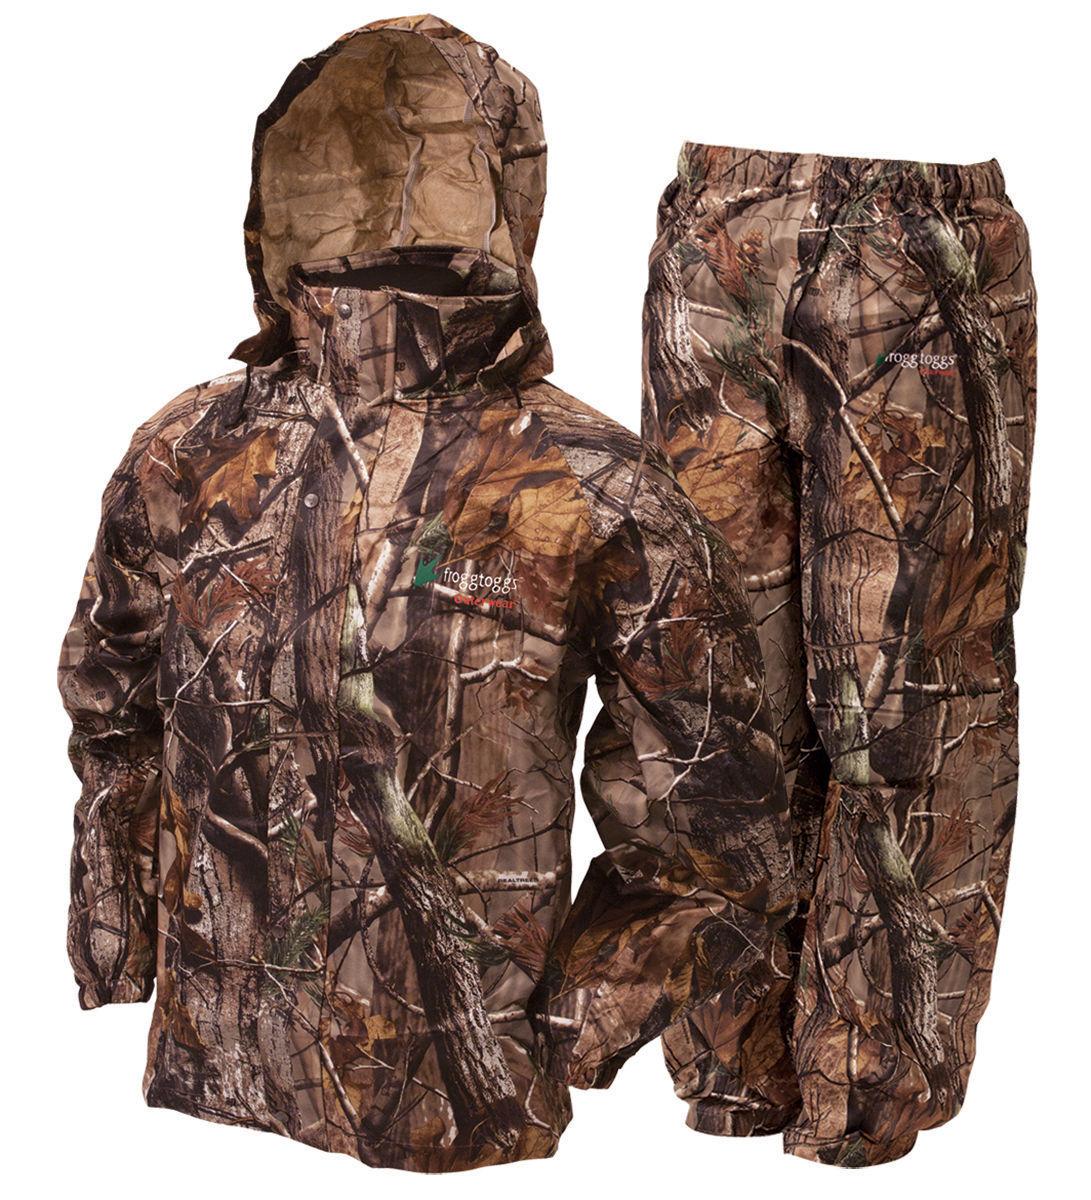 Best rain suit ebay for Rain suits for fishing